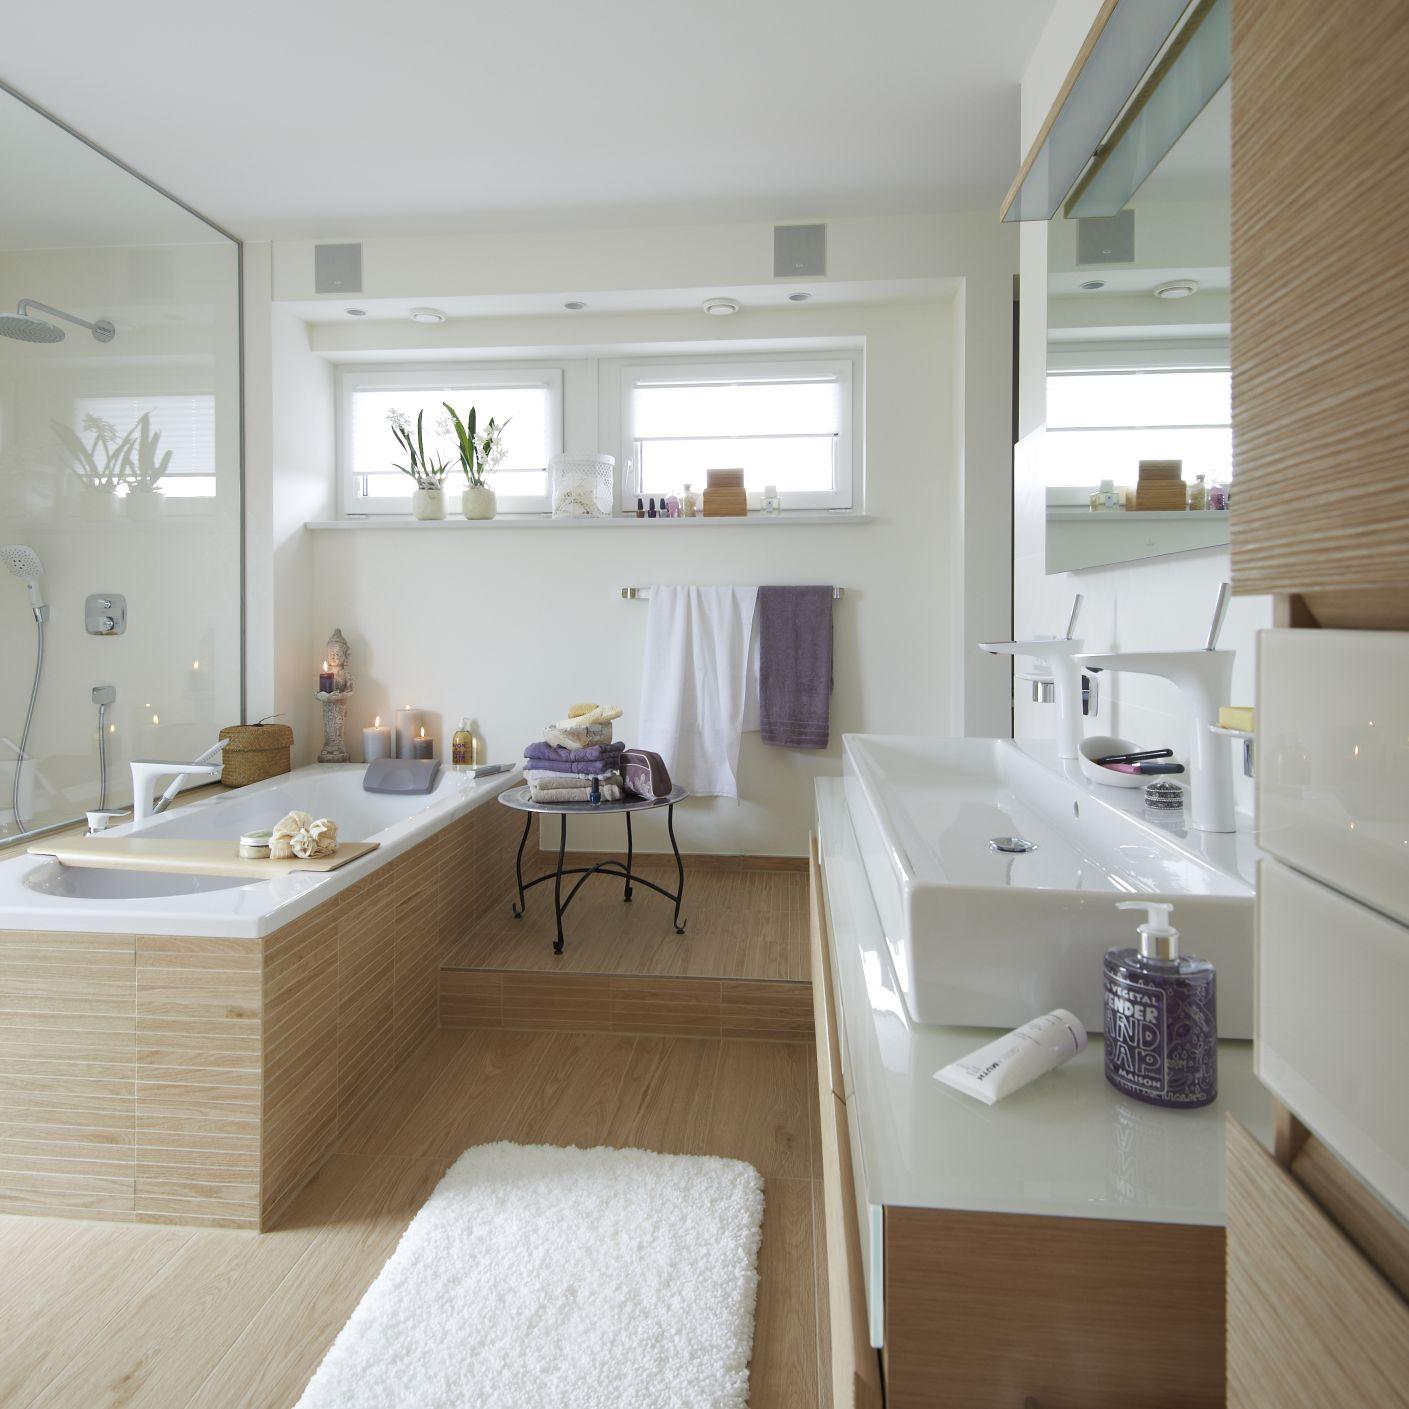 bemusterung unser haus edition 425. Black Bedroom Furniture Sets. Home Design Ideas